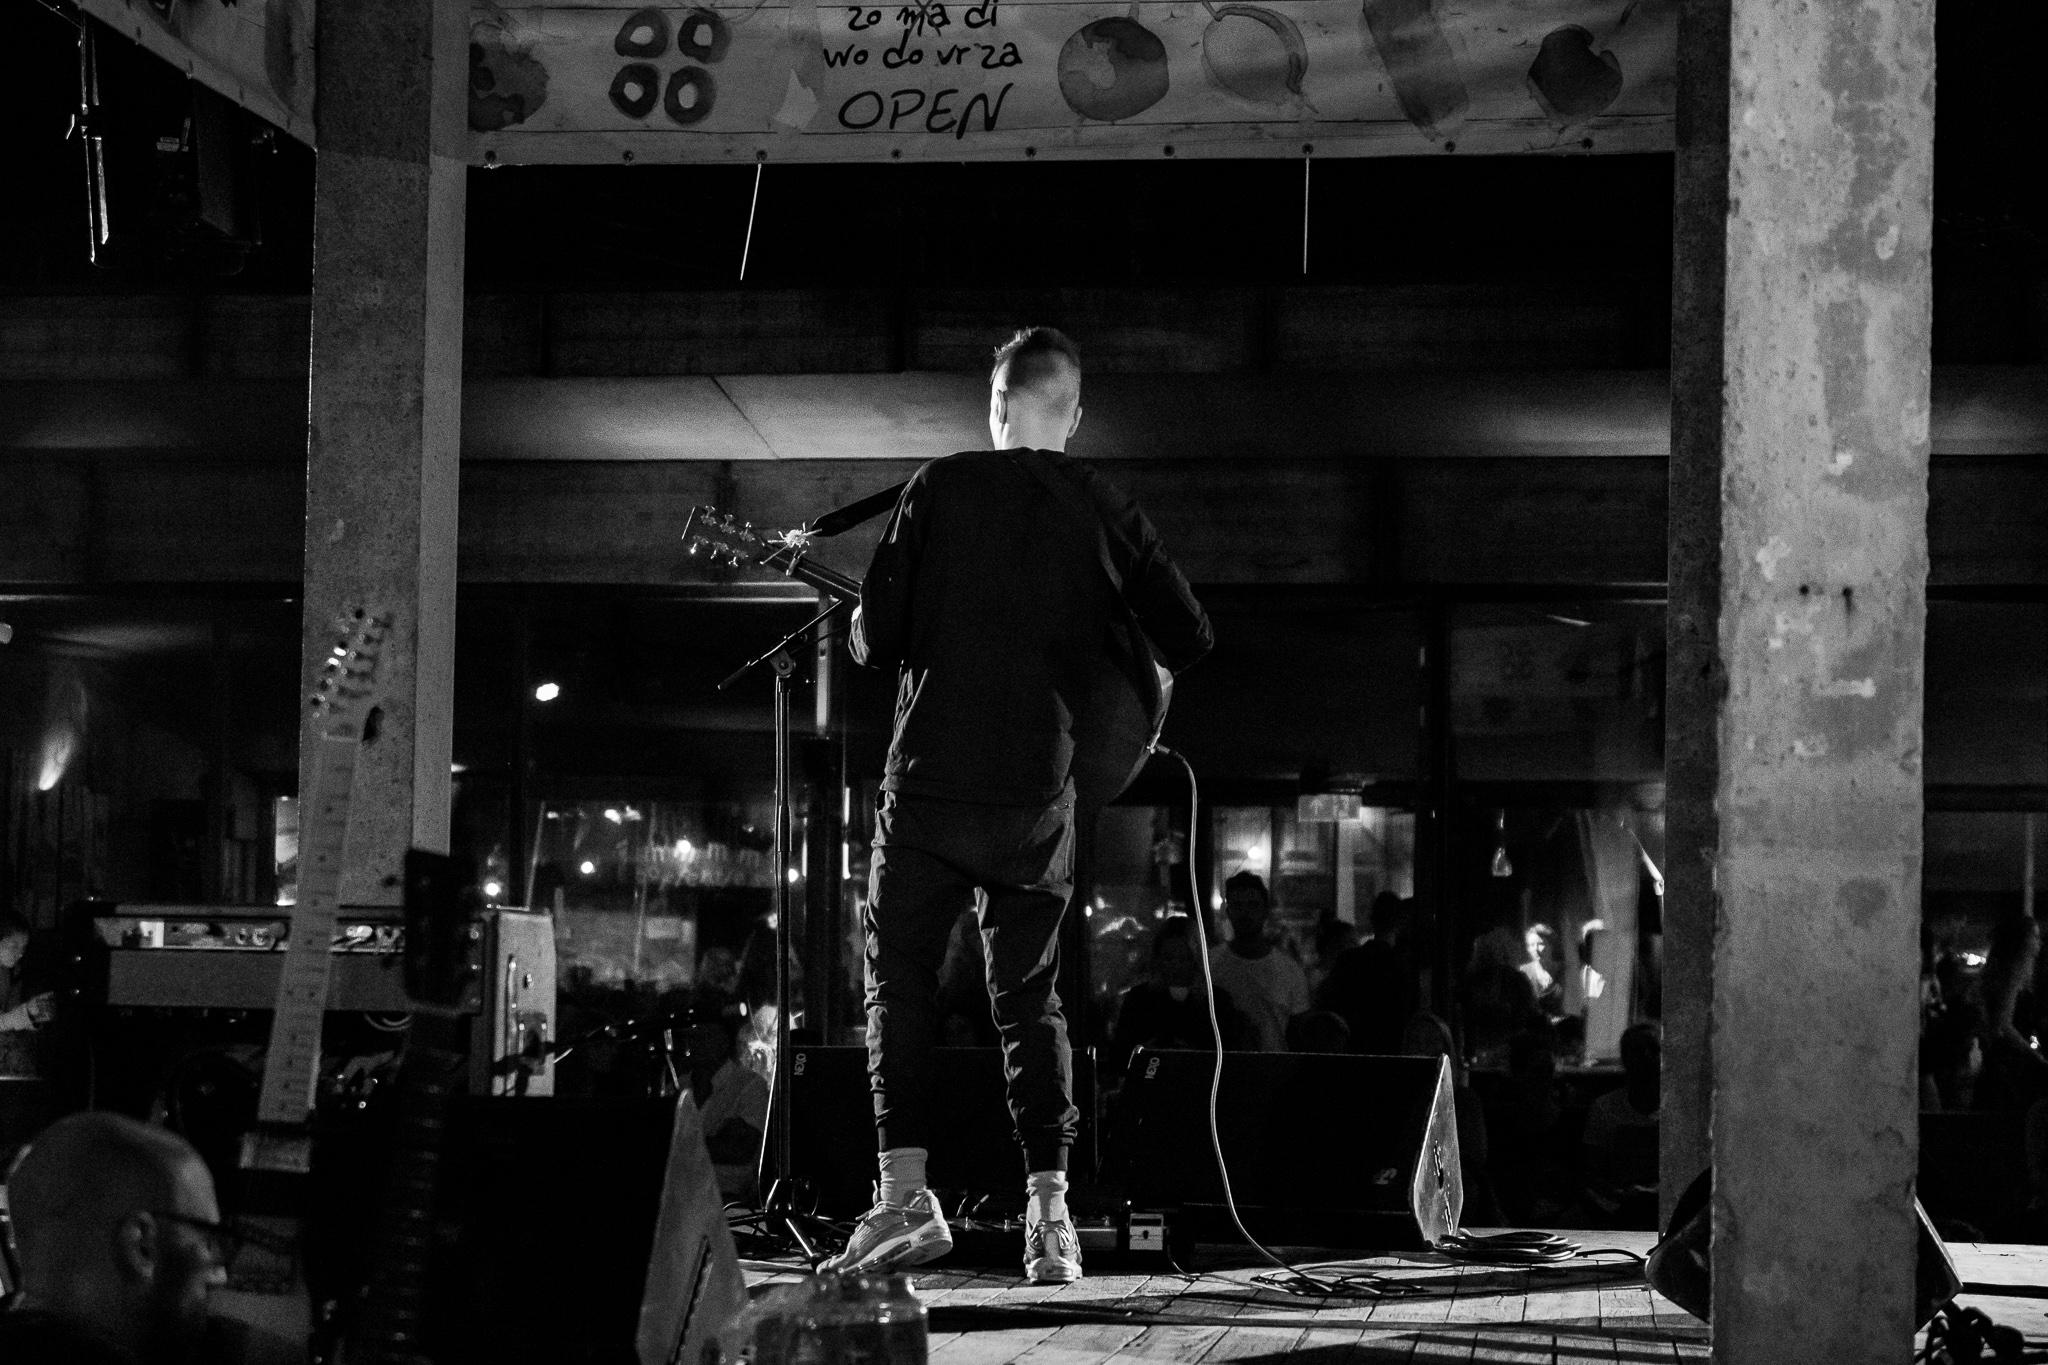 BenjaminFrancisLeftwich-FestivalTheBrave-Amsterdam_NL-20190824-SylviaWijnands-012